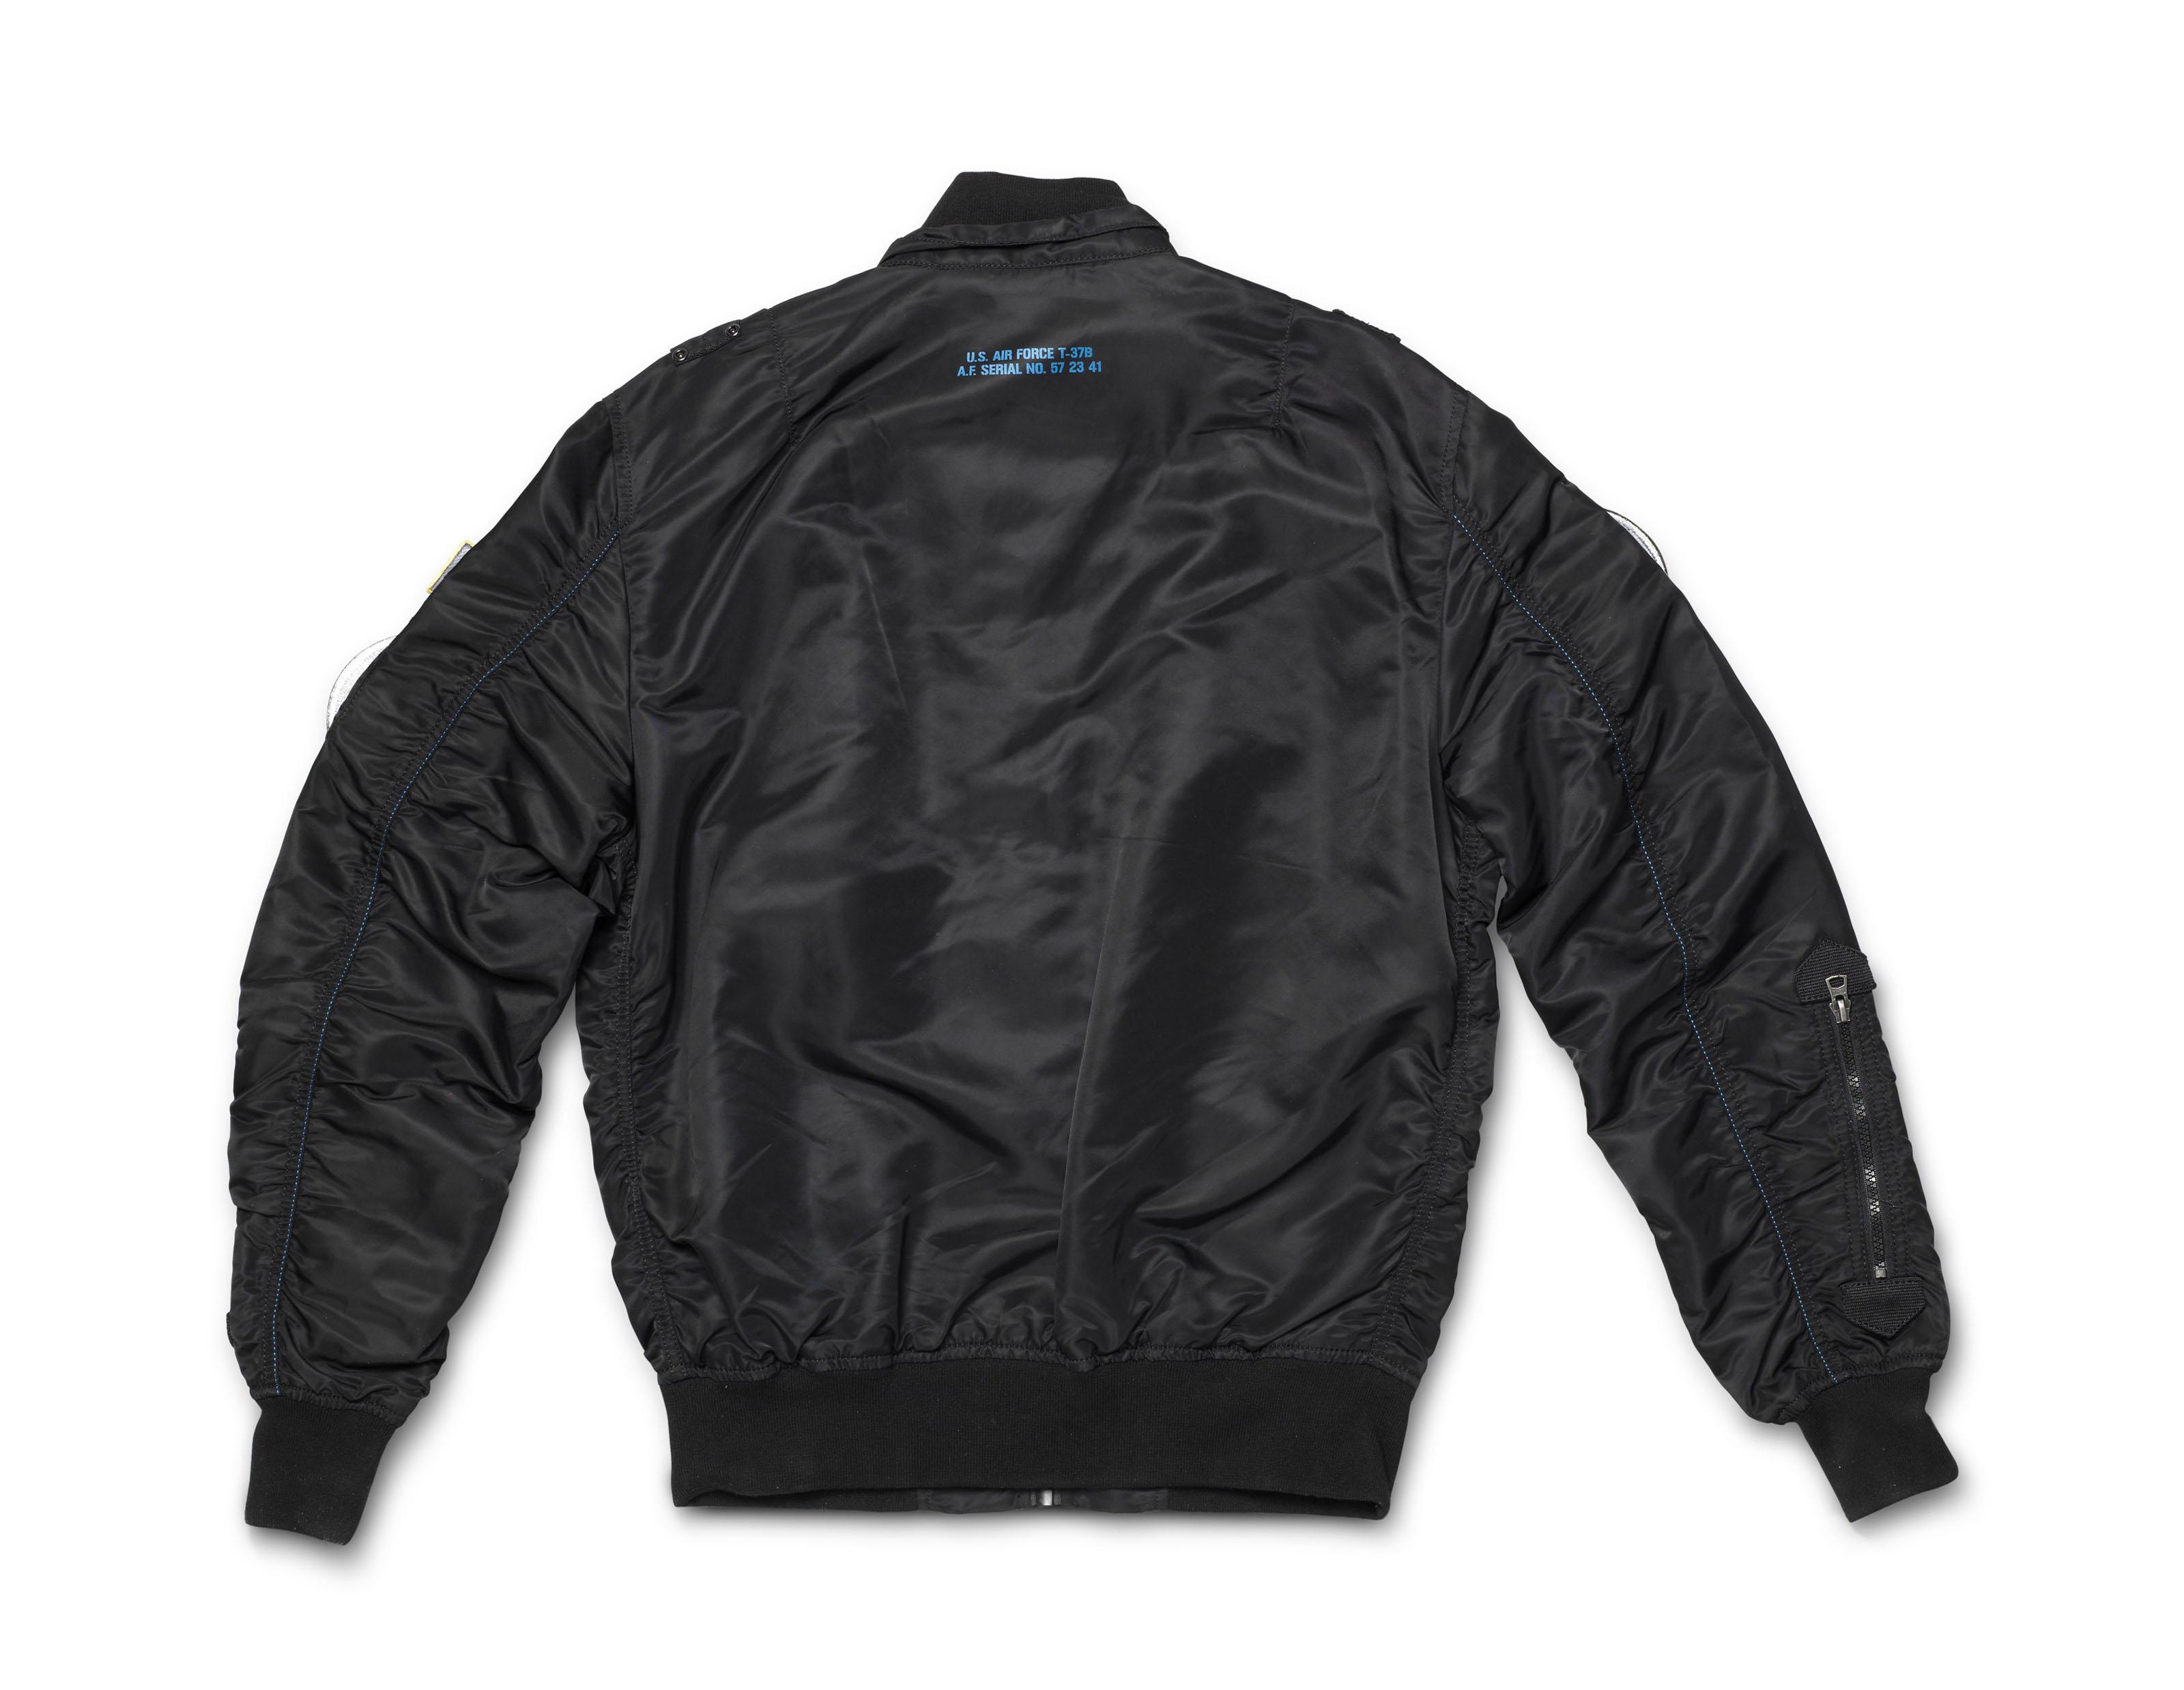 Stephen Hawking's bomber jacket